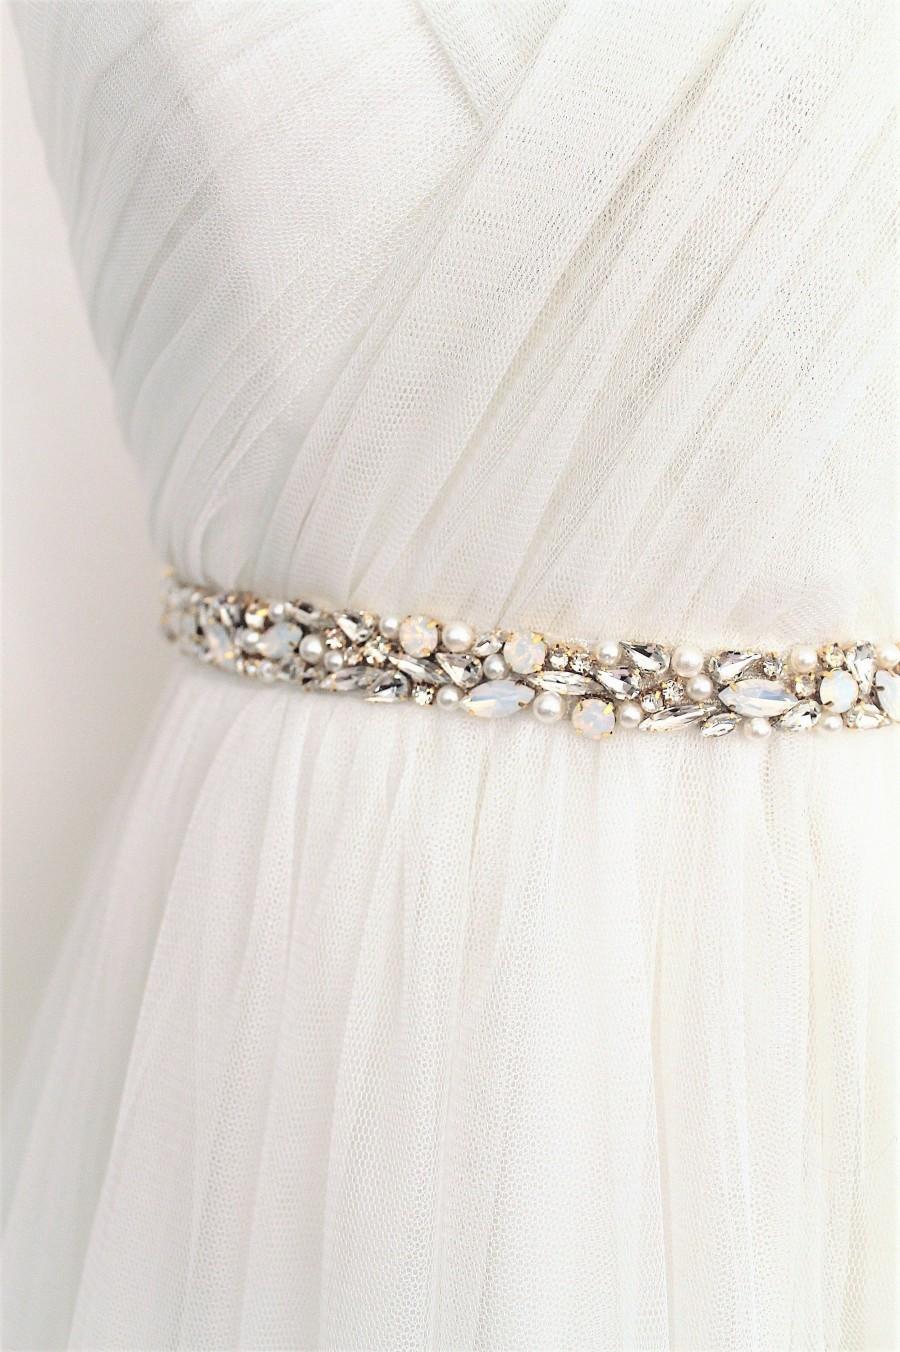 Mariage - Gold or Silver Opal Pearl Beaded Bridal Sash. All Around Thin Wedding Dress Belt. Slim Rhinestone Applique Trim Bridesmaid Sash. FAITH